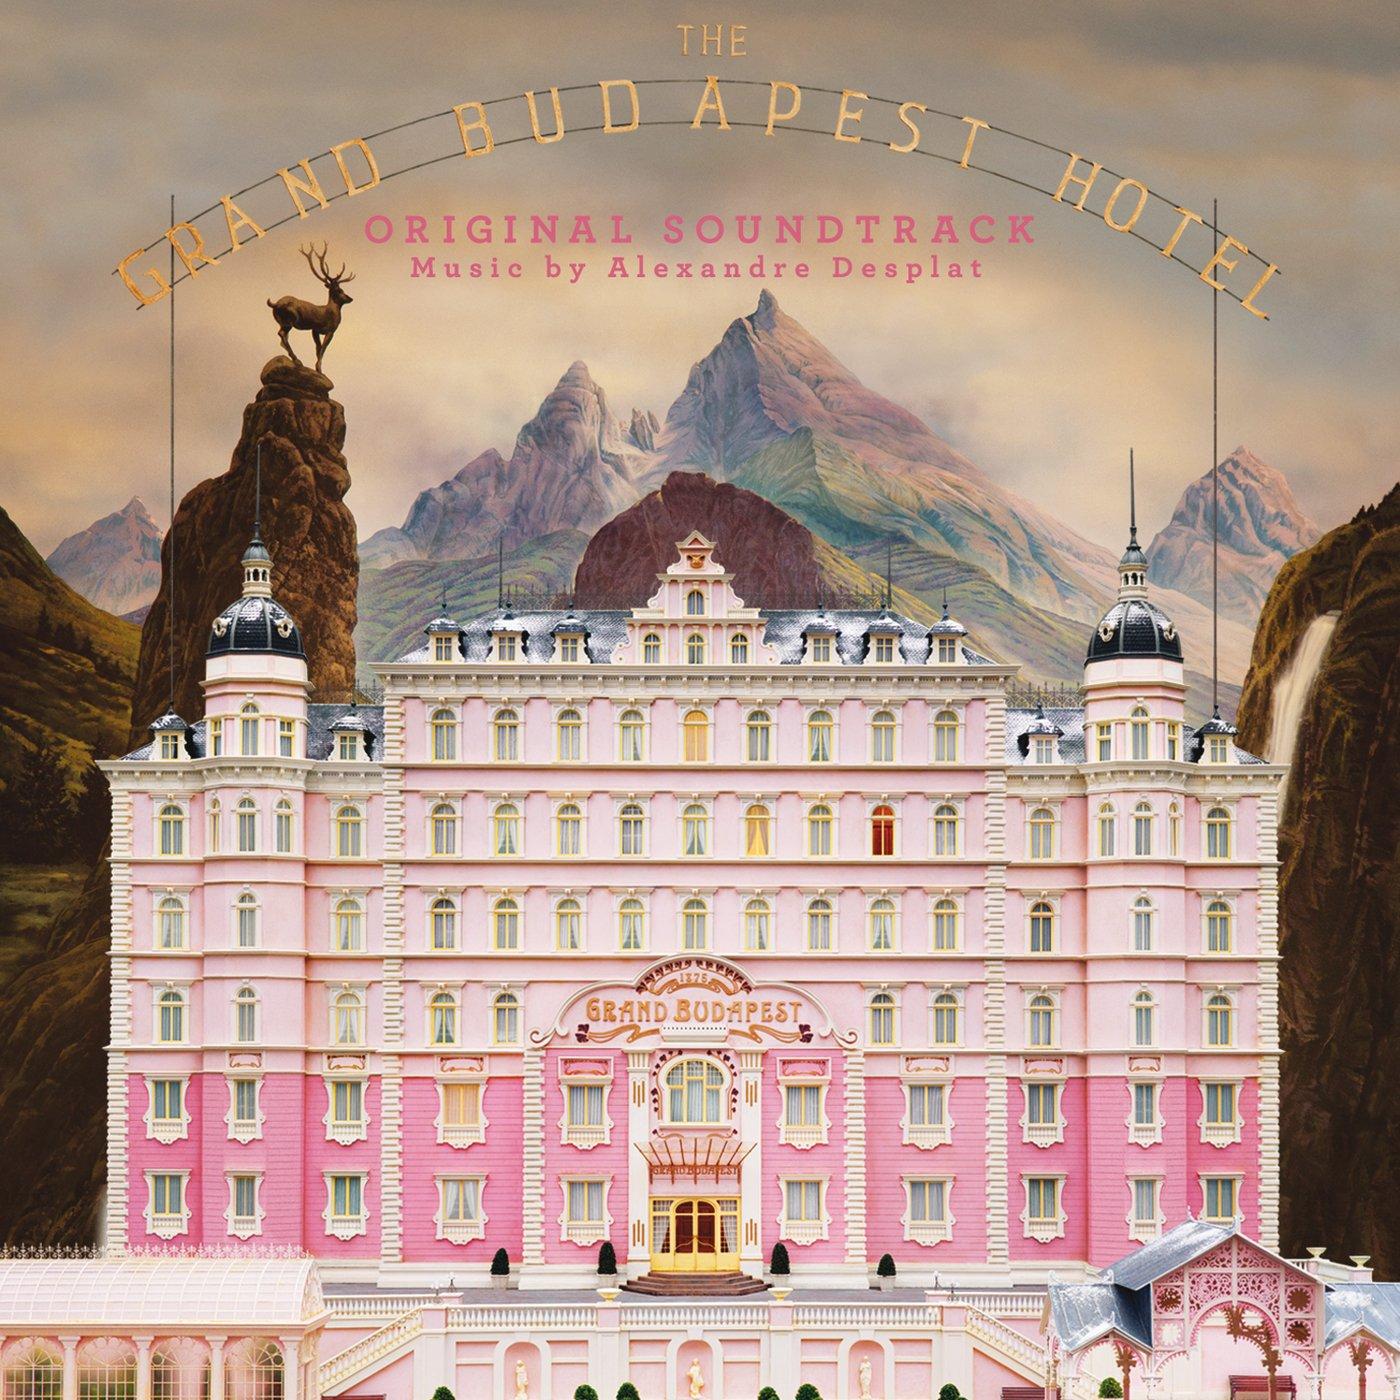 bande originale soundtrack ost score grand budapest hotel disney fox